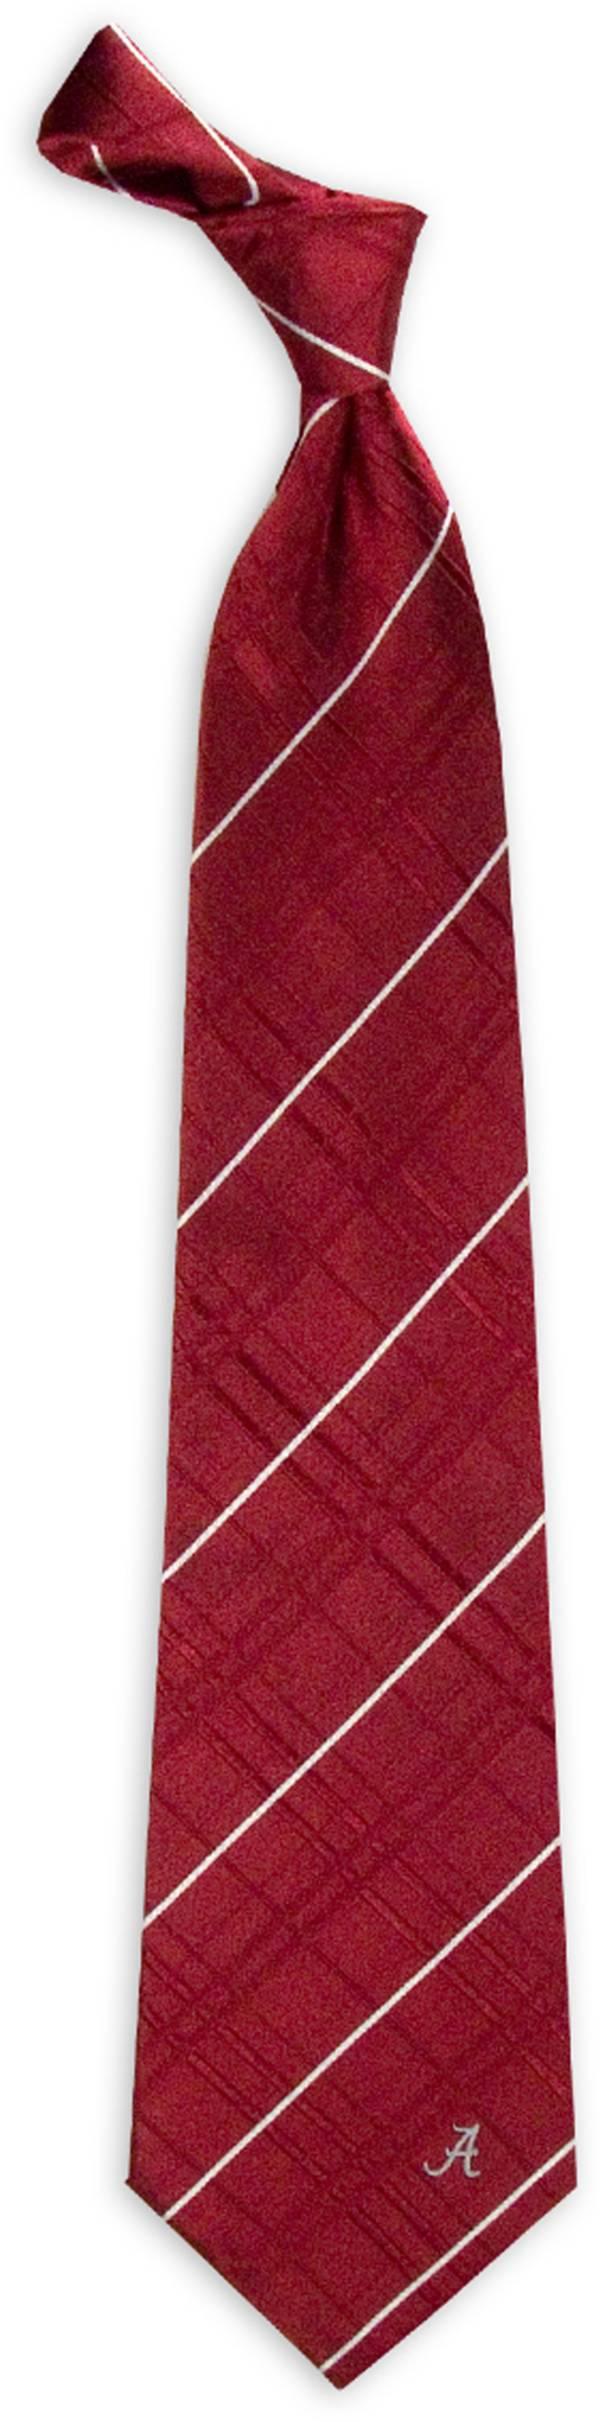 Eagles Wings Alabama Crimson Tide Woven Oxford Necktie product image